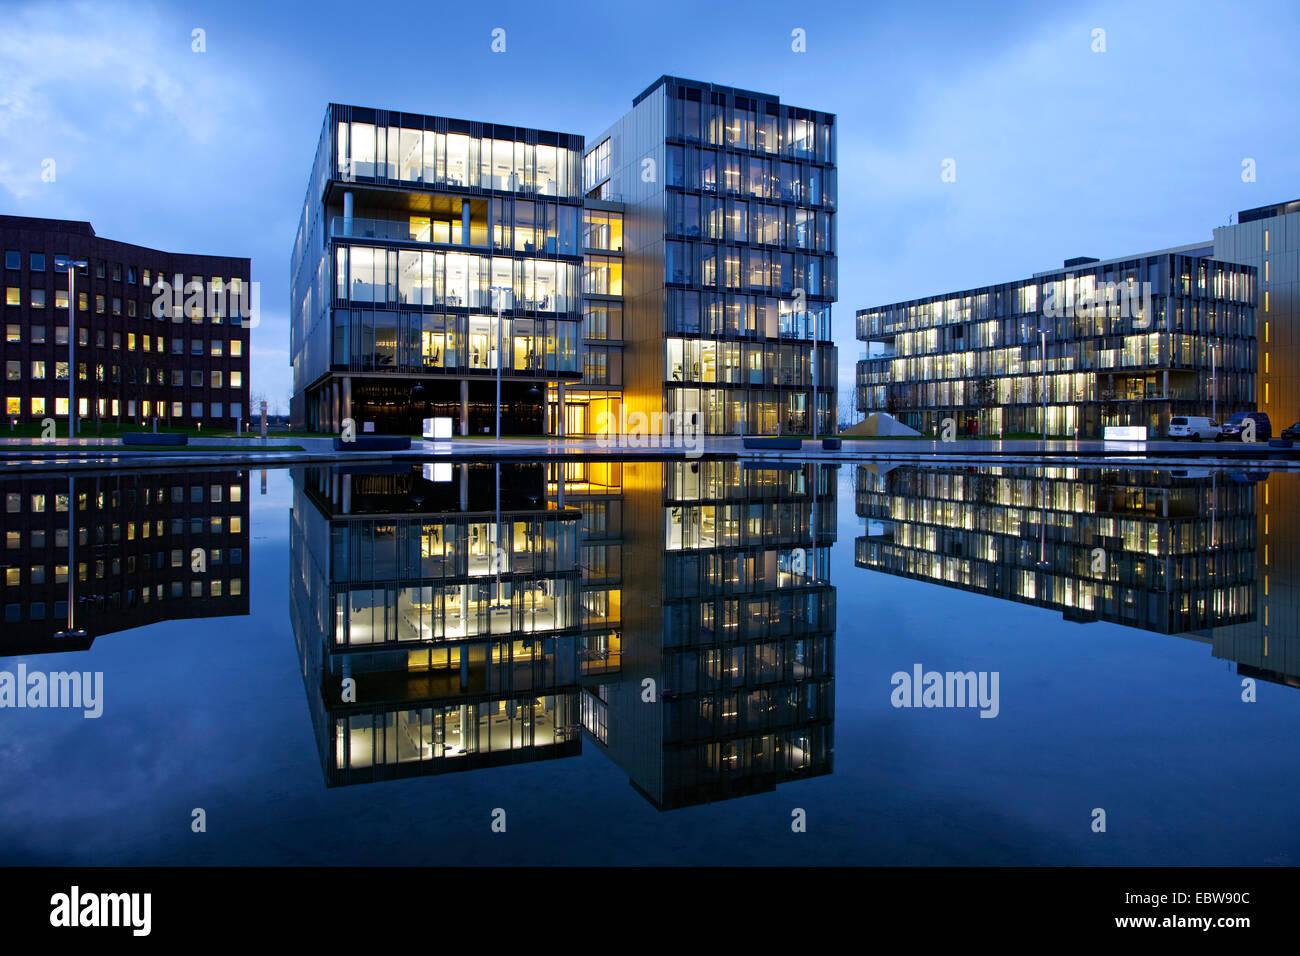 ThyssenKrupp corporate headquarters in twilight, Germany, North Rhine-Westphalia, Ruhr Area, Essen - Stock Image